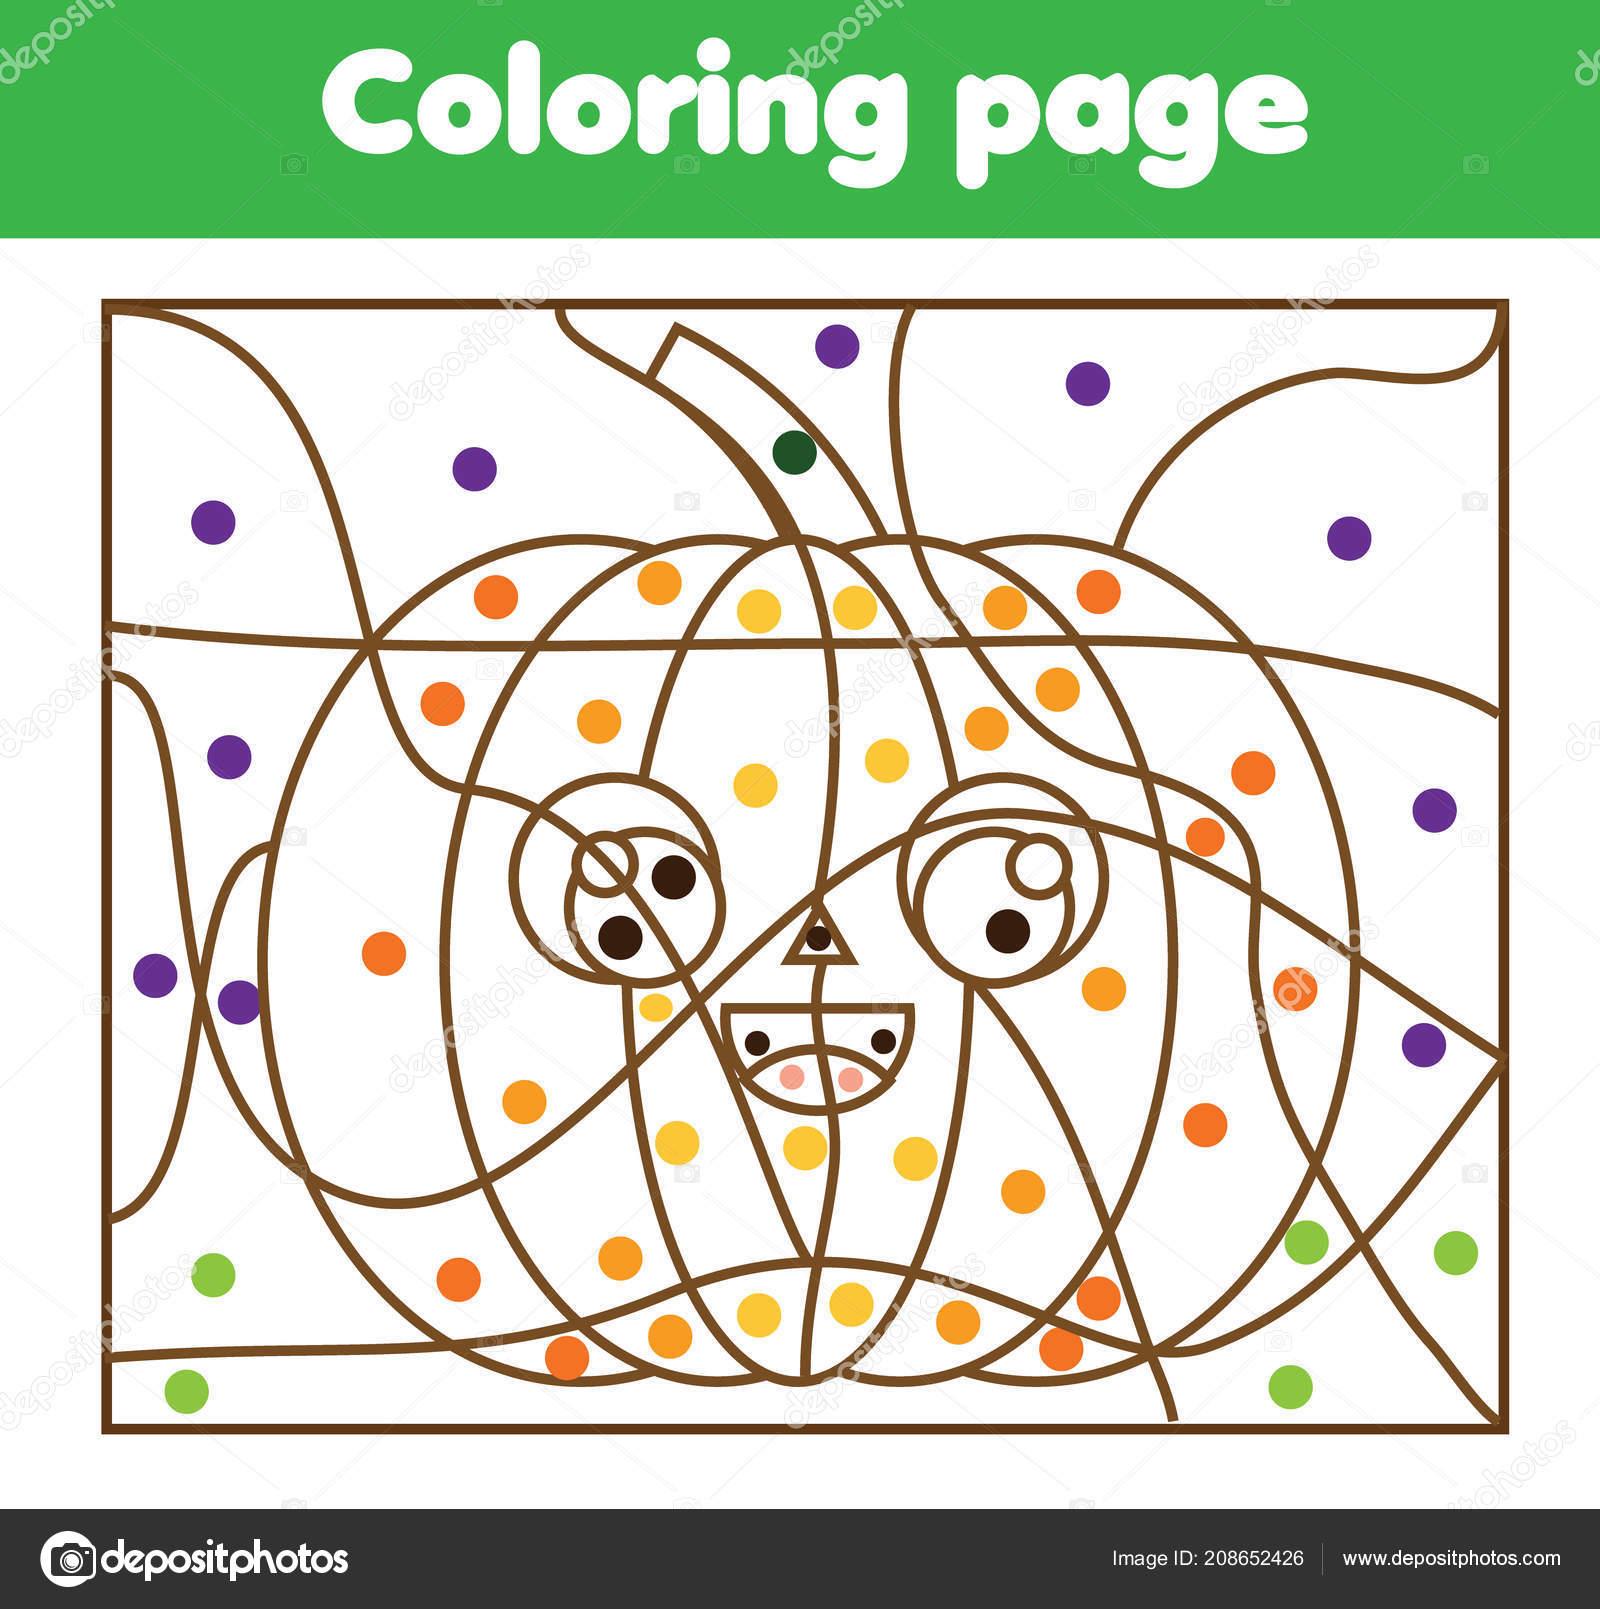 Halloween Pumpkin Coloring Pages Printables Children Educational Game Coloring Page Cartoon Halloween Pumpkin